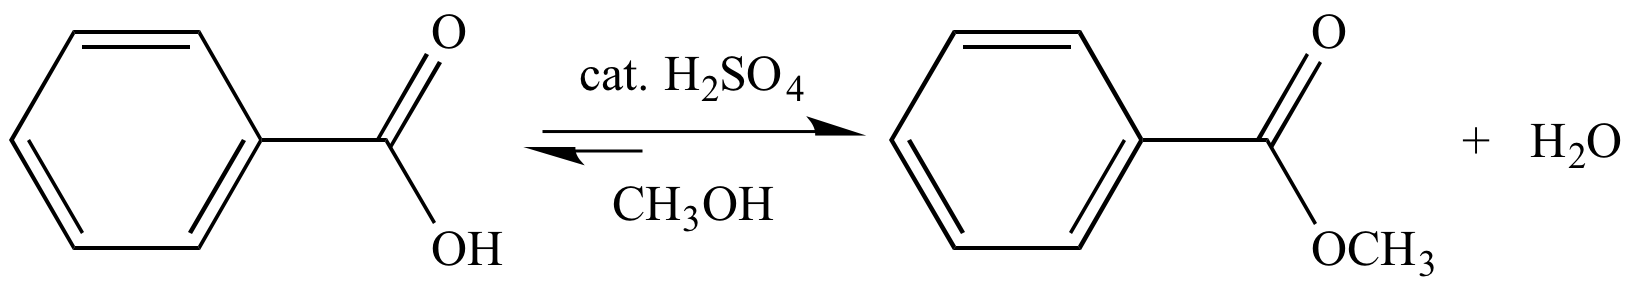 fischer esterification of benzoic acid